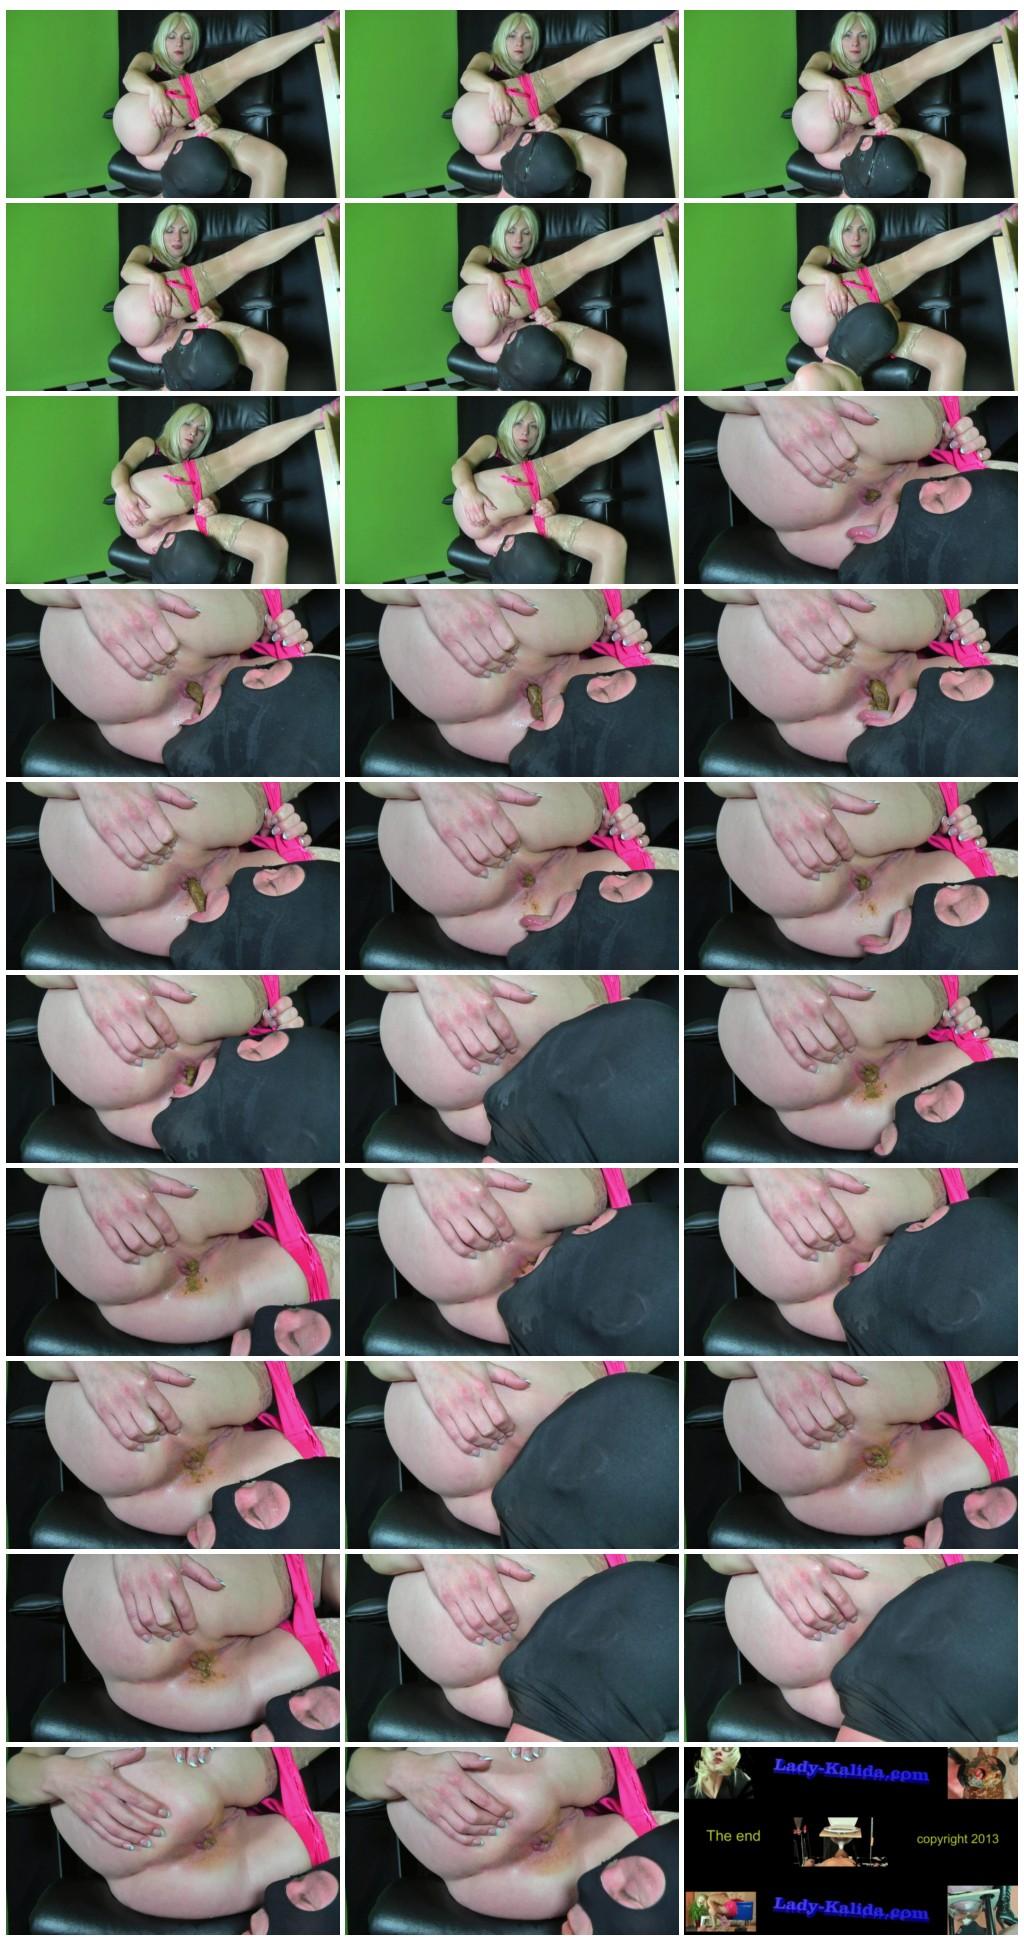 Lady Kalida.com Femdom Theater.com Lady Kalida. Colon Extention Femdom Scat Pissing Vomit BDSM Facesitting Trampling Enema Spitting Whipping Humiliation thumb - [Lady-Kalida com - Femdom-Theater com] Lady Kalida  Colon Extention [Femdom, Scat, Pissing, Vomit, BDSM, Facesitting, Trampling, Enema, Spitting, Whipping, Humiliation]